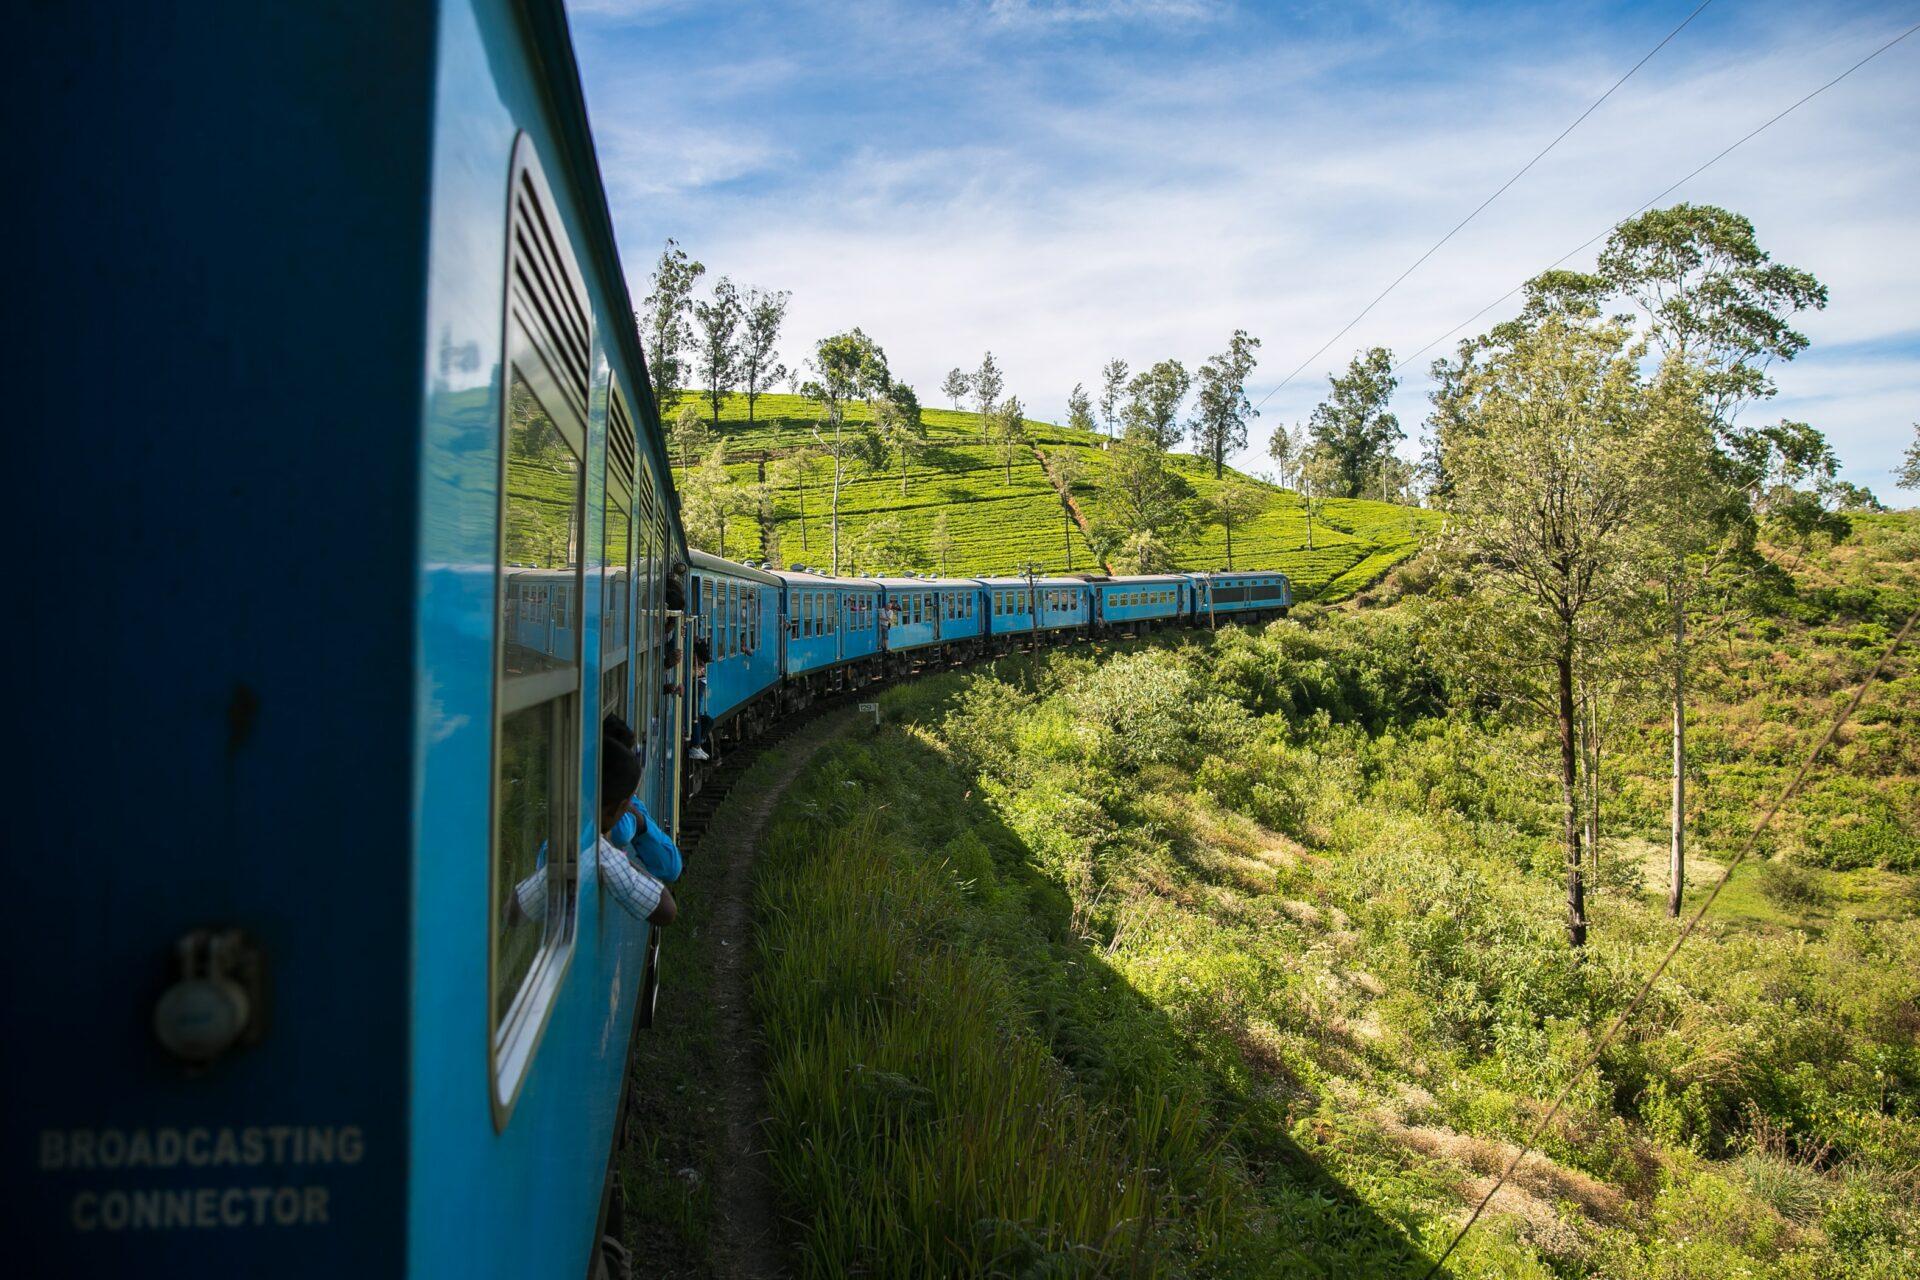 Duurzaam reizen in Sri Lanka - massa toerisme - TravelRebel - Reisblog